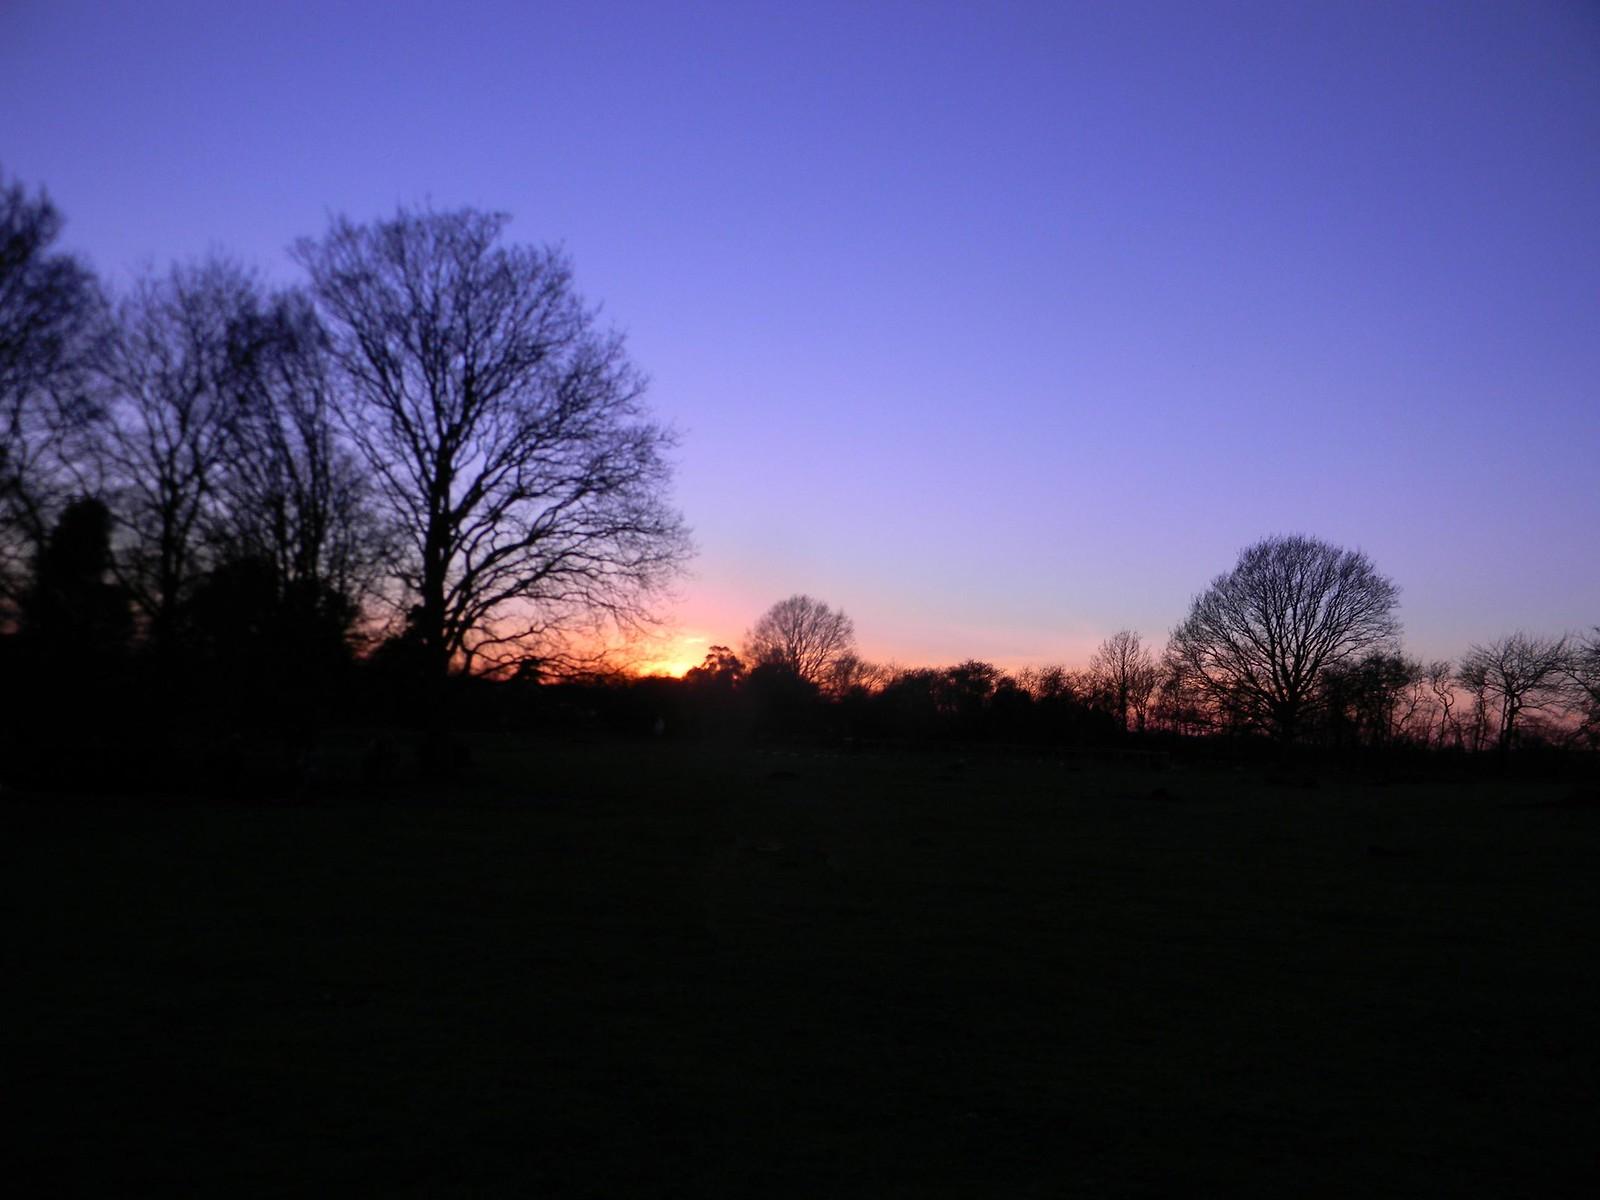 Trees at dusk 1 Appledore Short Circular